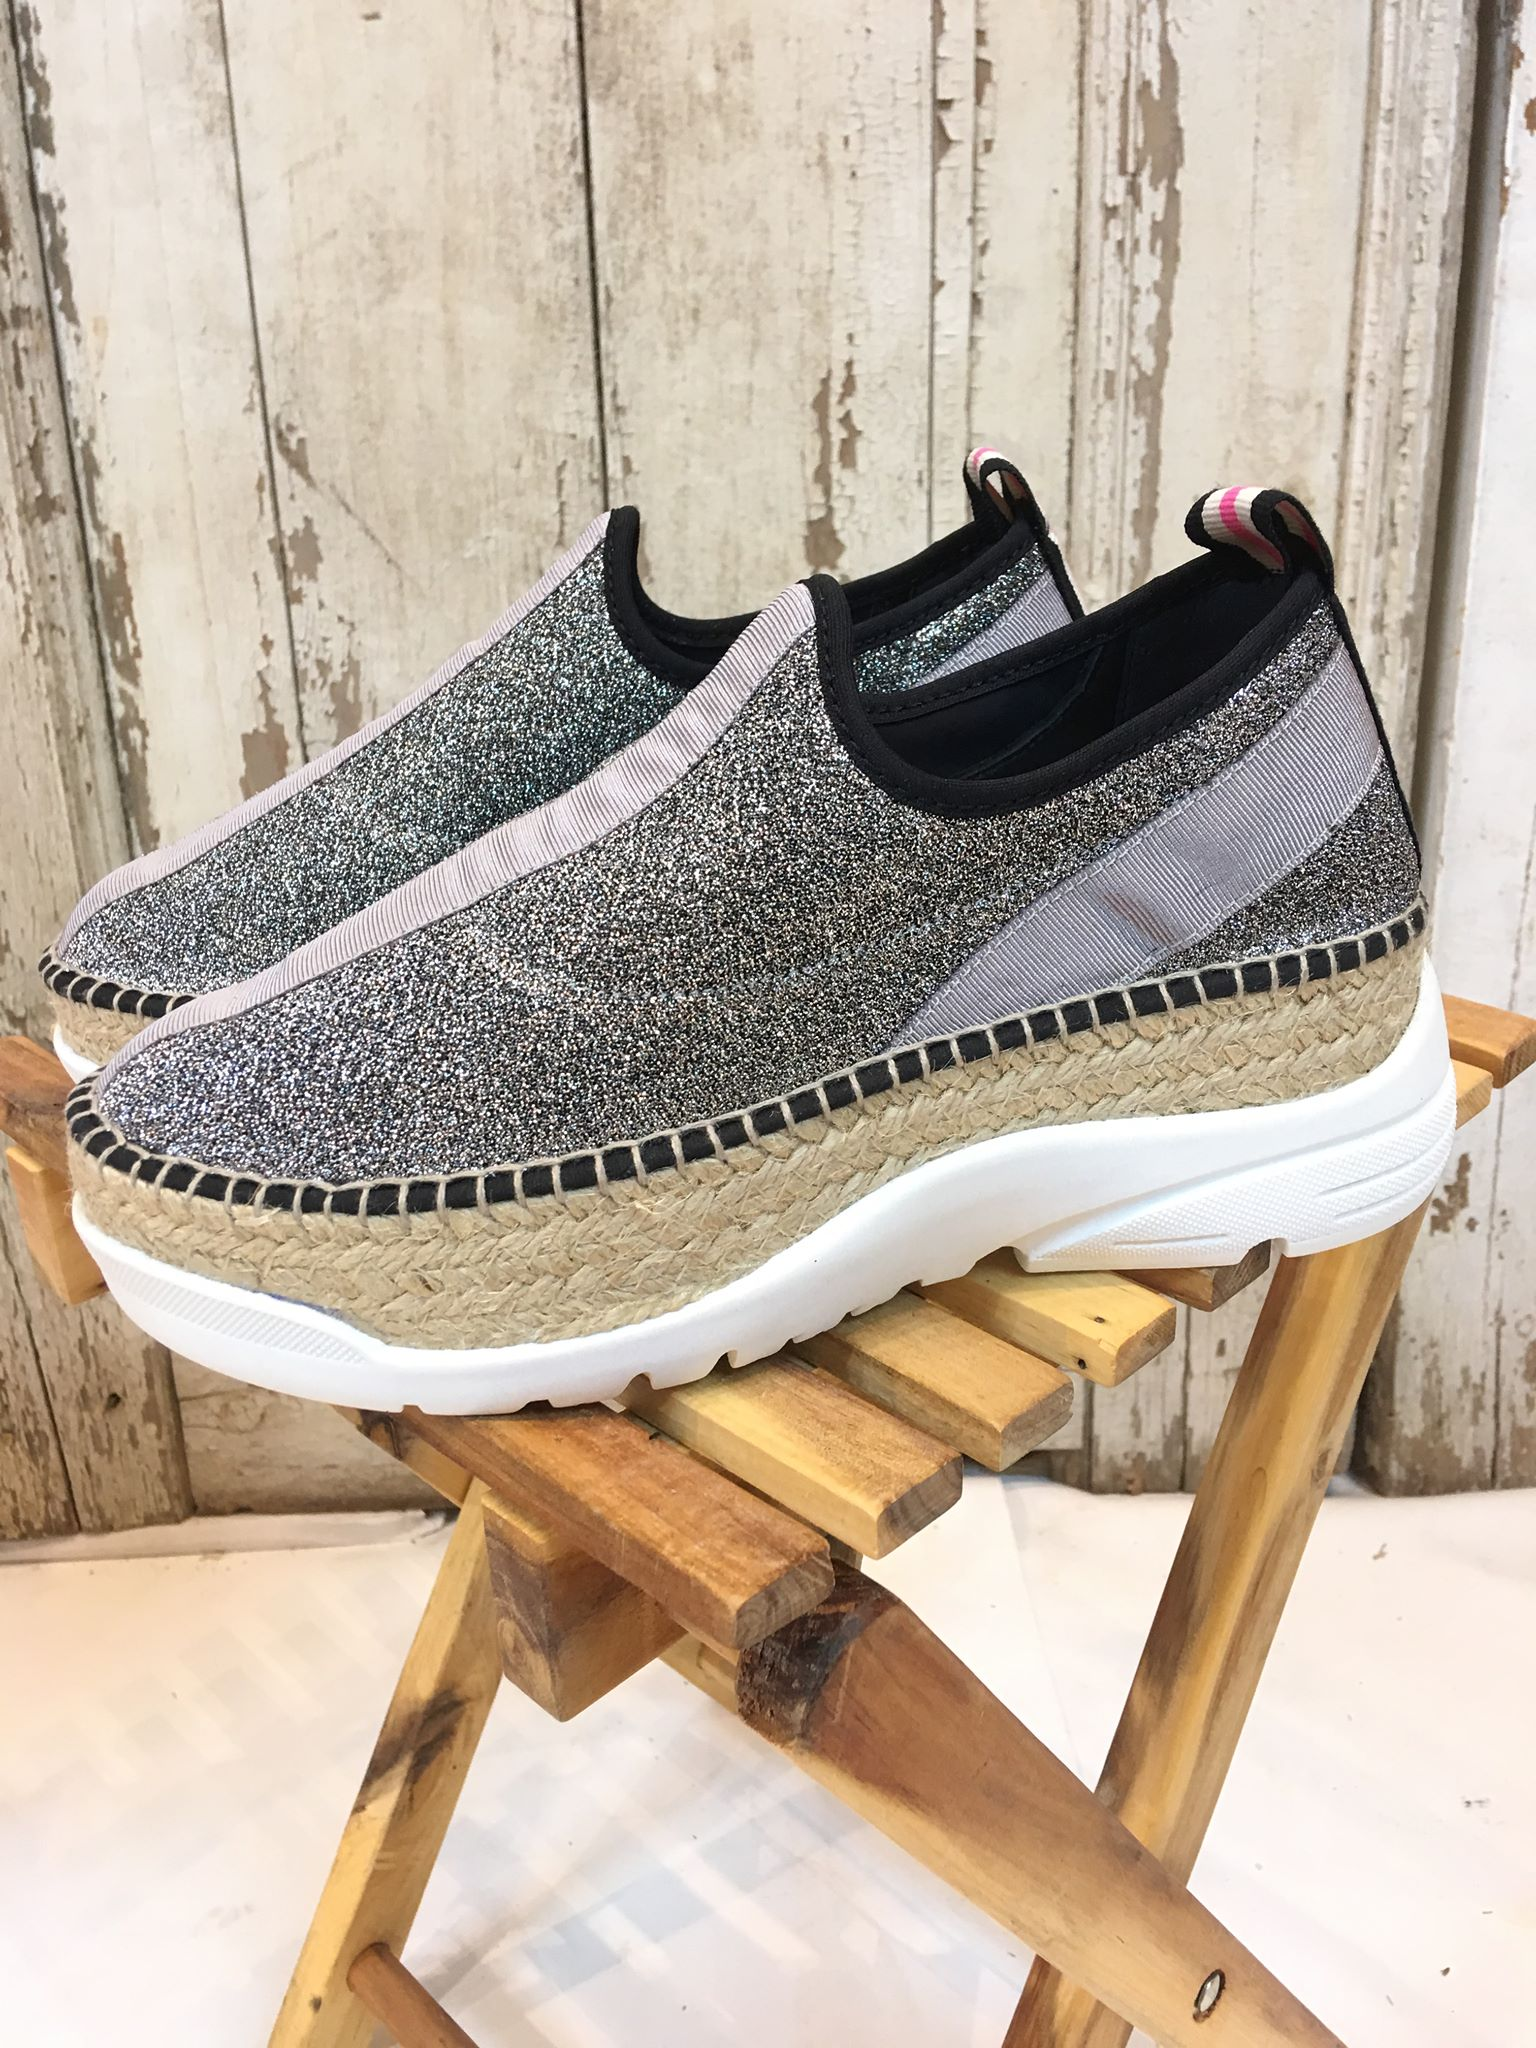 96682bf5 Sko fra Gamio, espadrillos og sneakers, sko med kraftig platå-såle.